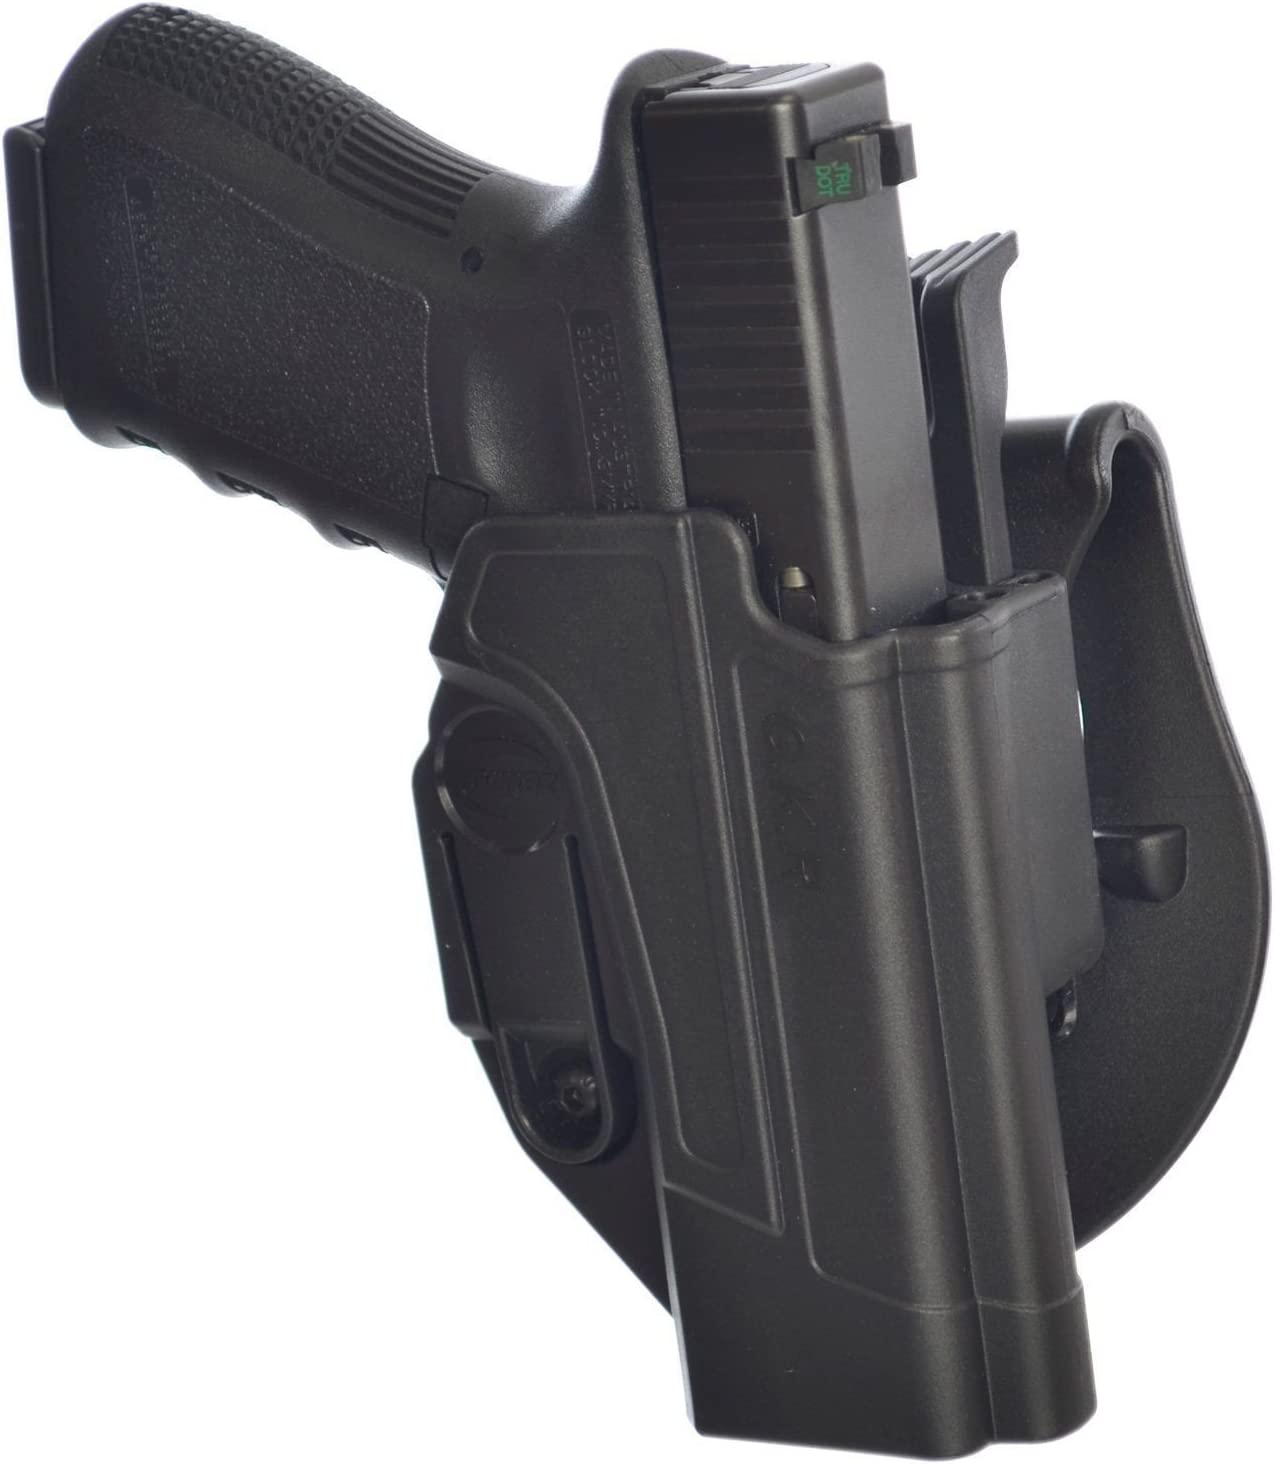 Orpaz Glock 34 Thumb Release Holster Black Polymer Rotation Paddle  Adjustment